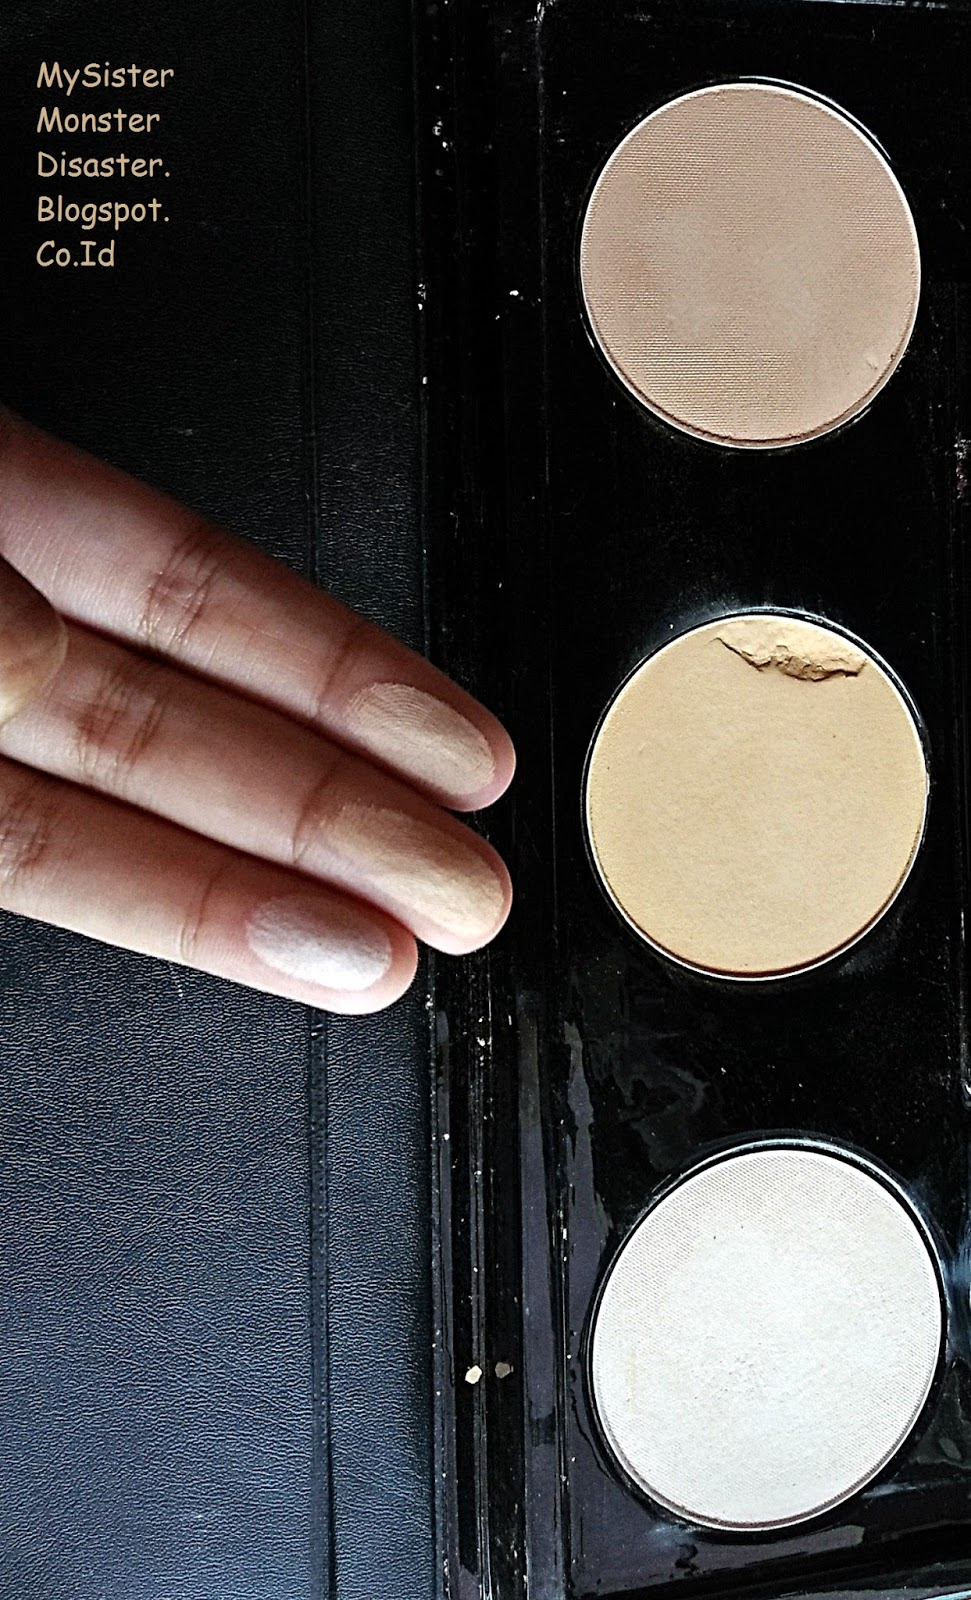 (REVIEW) Wardah Spesial Edition Makeup Kit